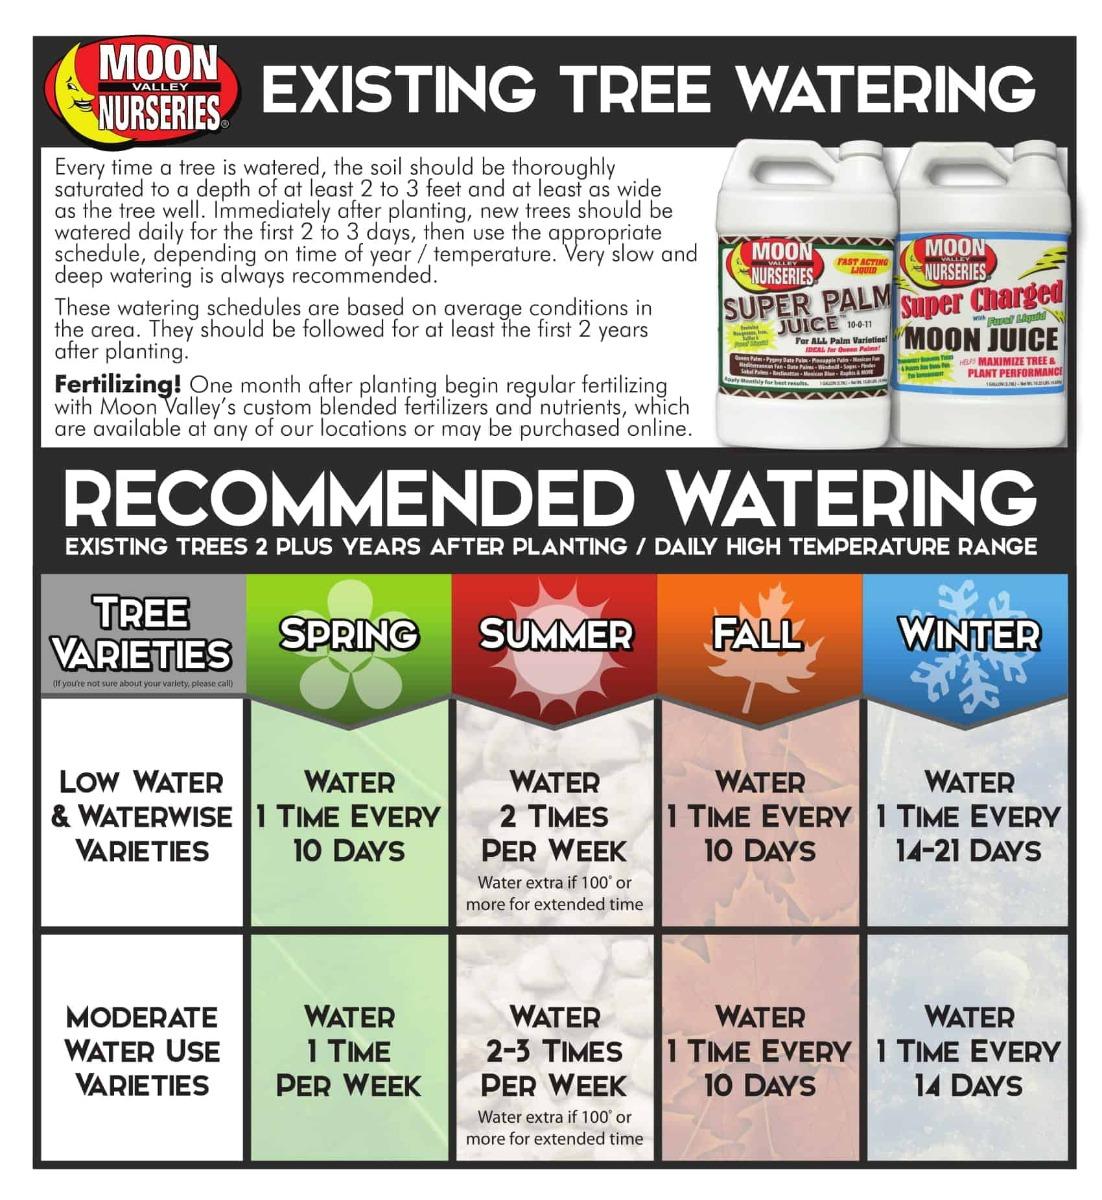 Watering Mature Trees Schedule